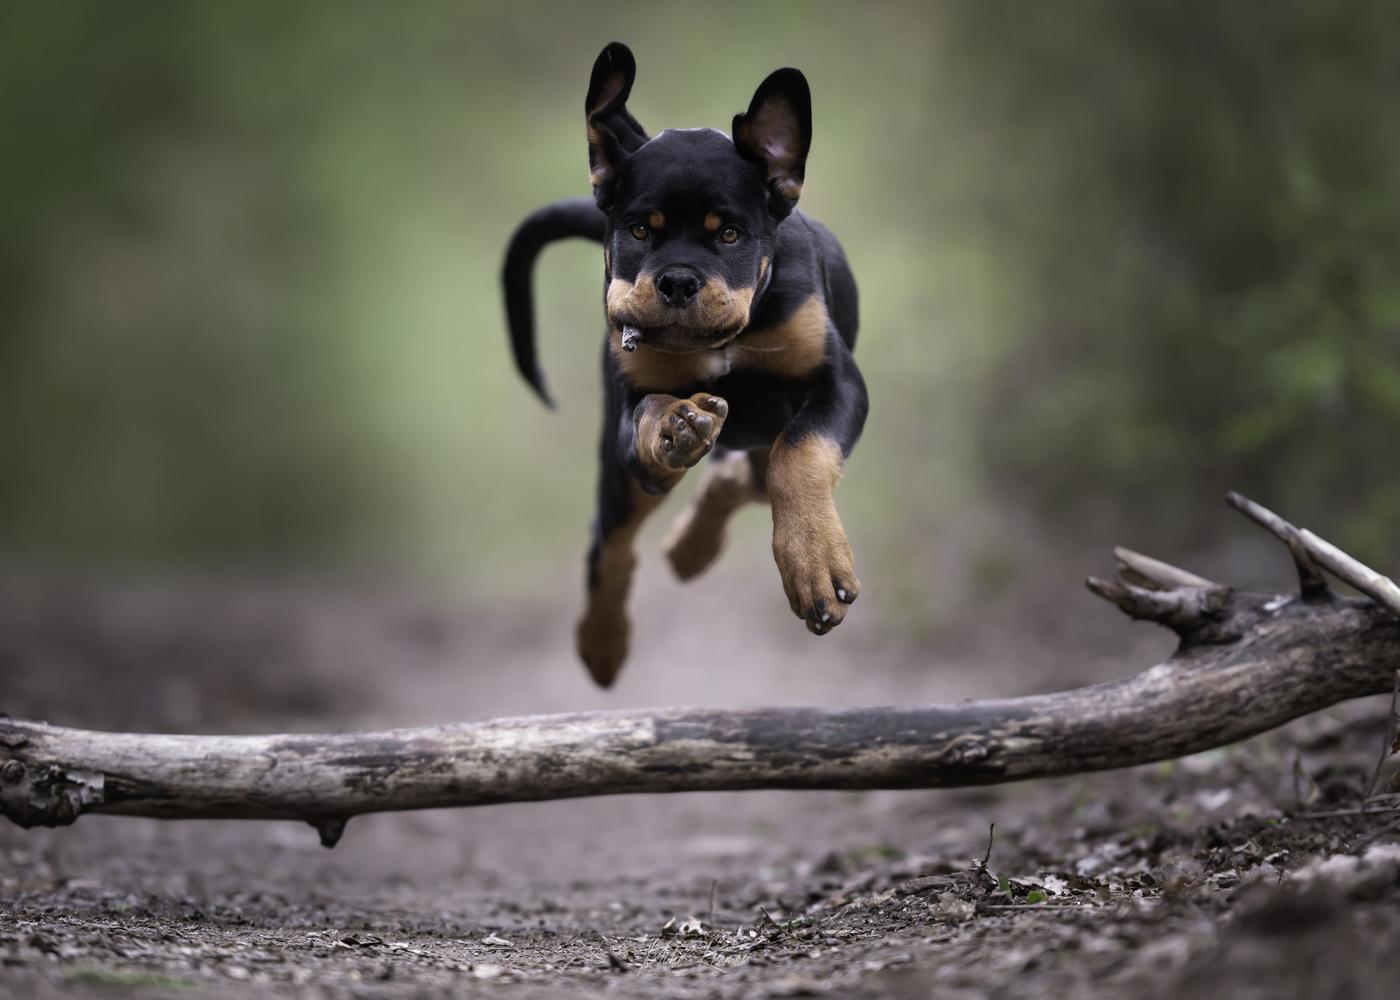 KOWU - cool little puppy by Mike Kremer